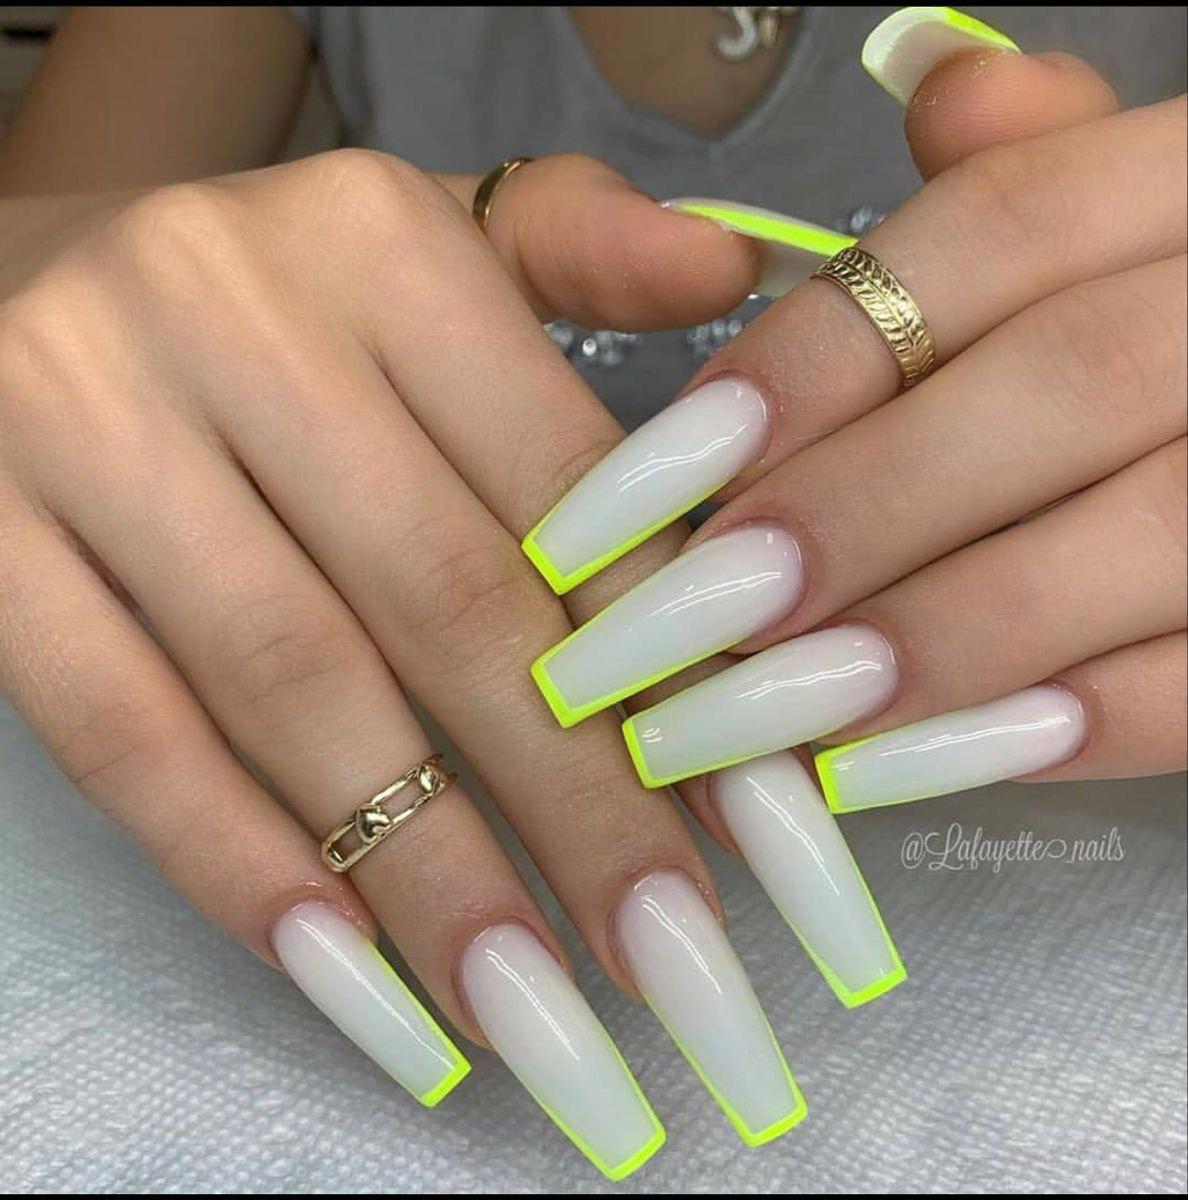 Nails Pictures Compilations Fotos Increibles De Unas 2018 Youtube In 2020 Summer Acrylic Nails Neon Acrylic Nails Long Acrylic Nails